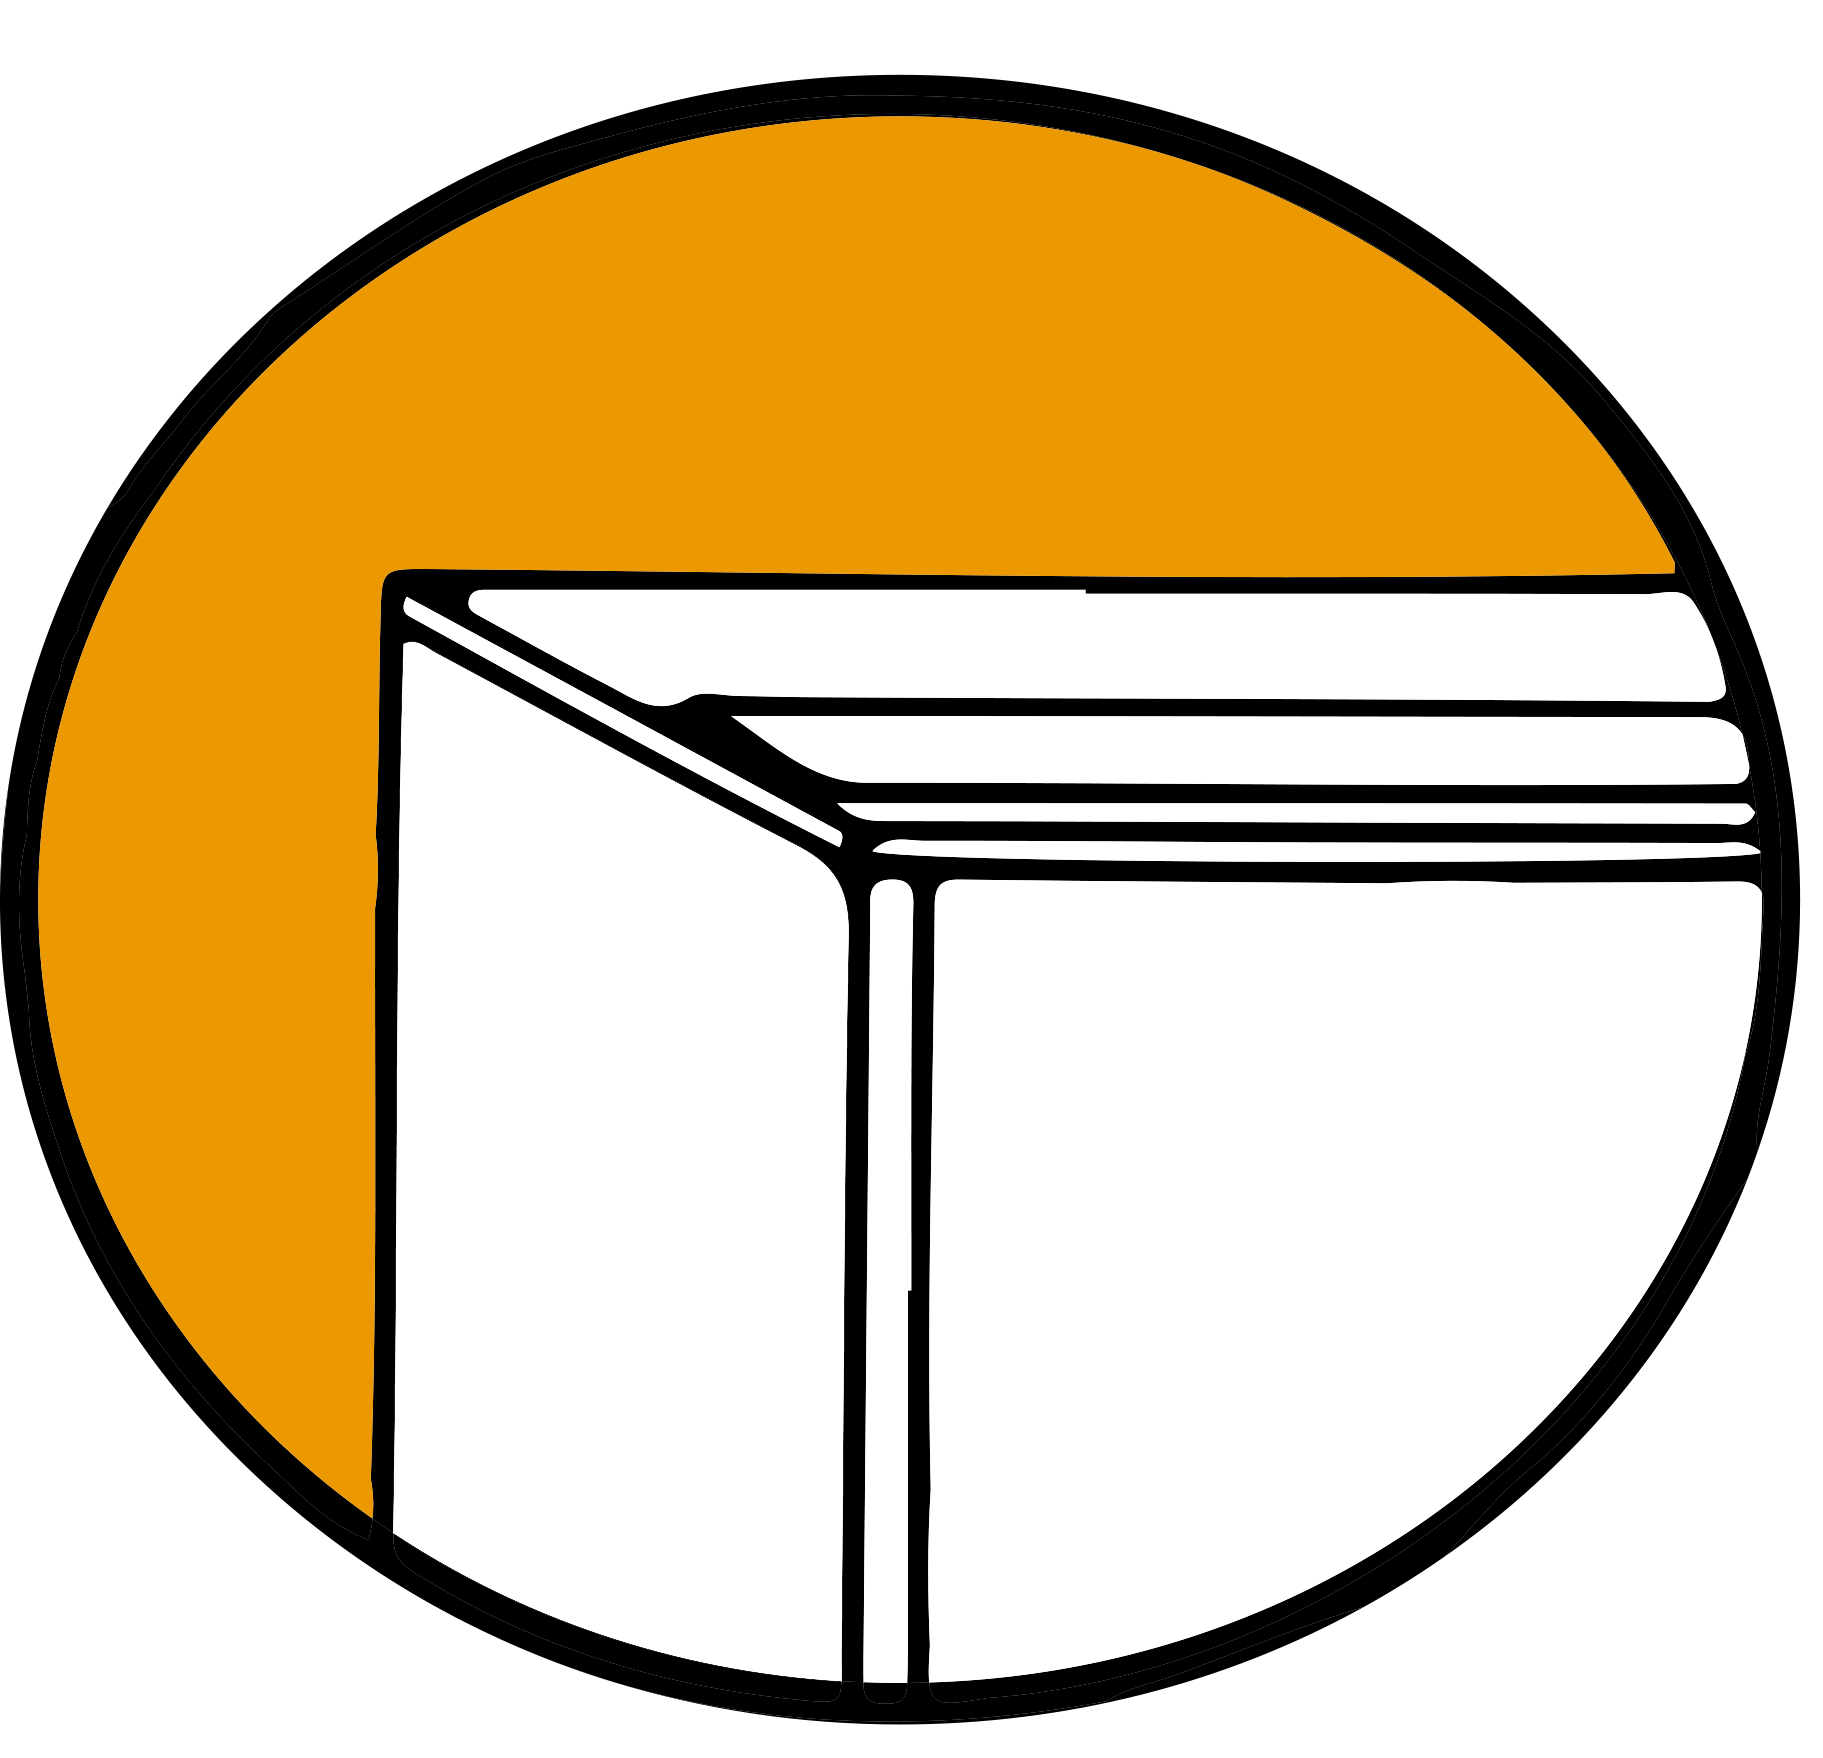 multimedia-packaging-overlap interlockribbed-spineribbed-sidewallssquare-spine